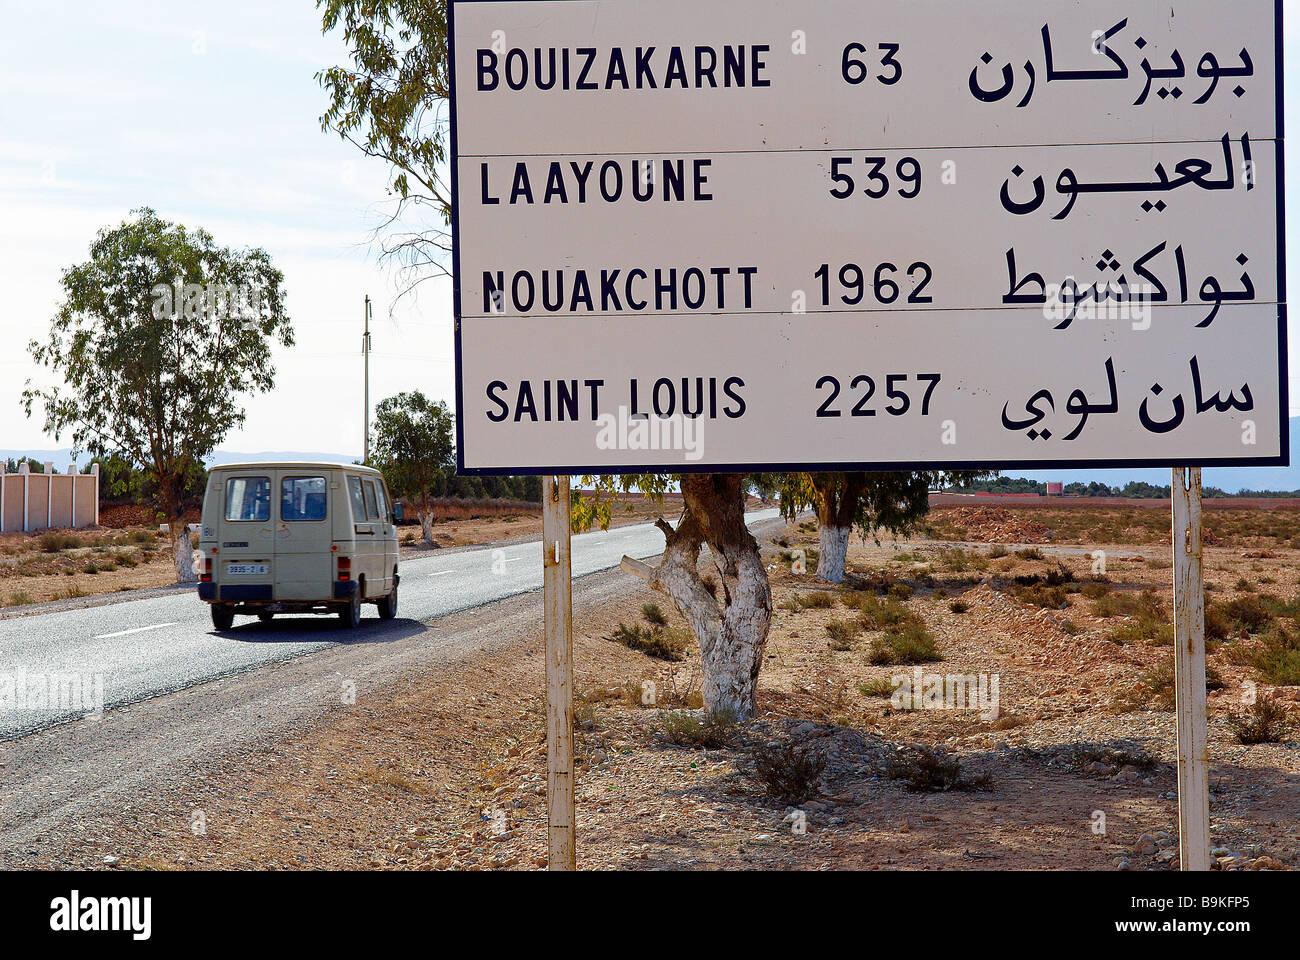 Morocco, direction signs with kilometric distances - Stock Image